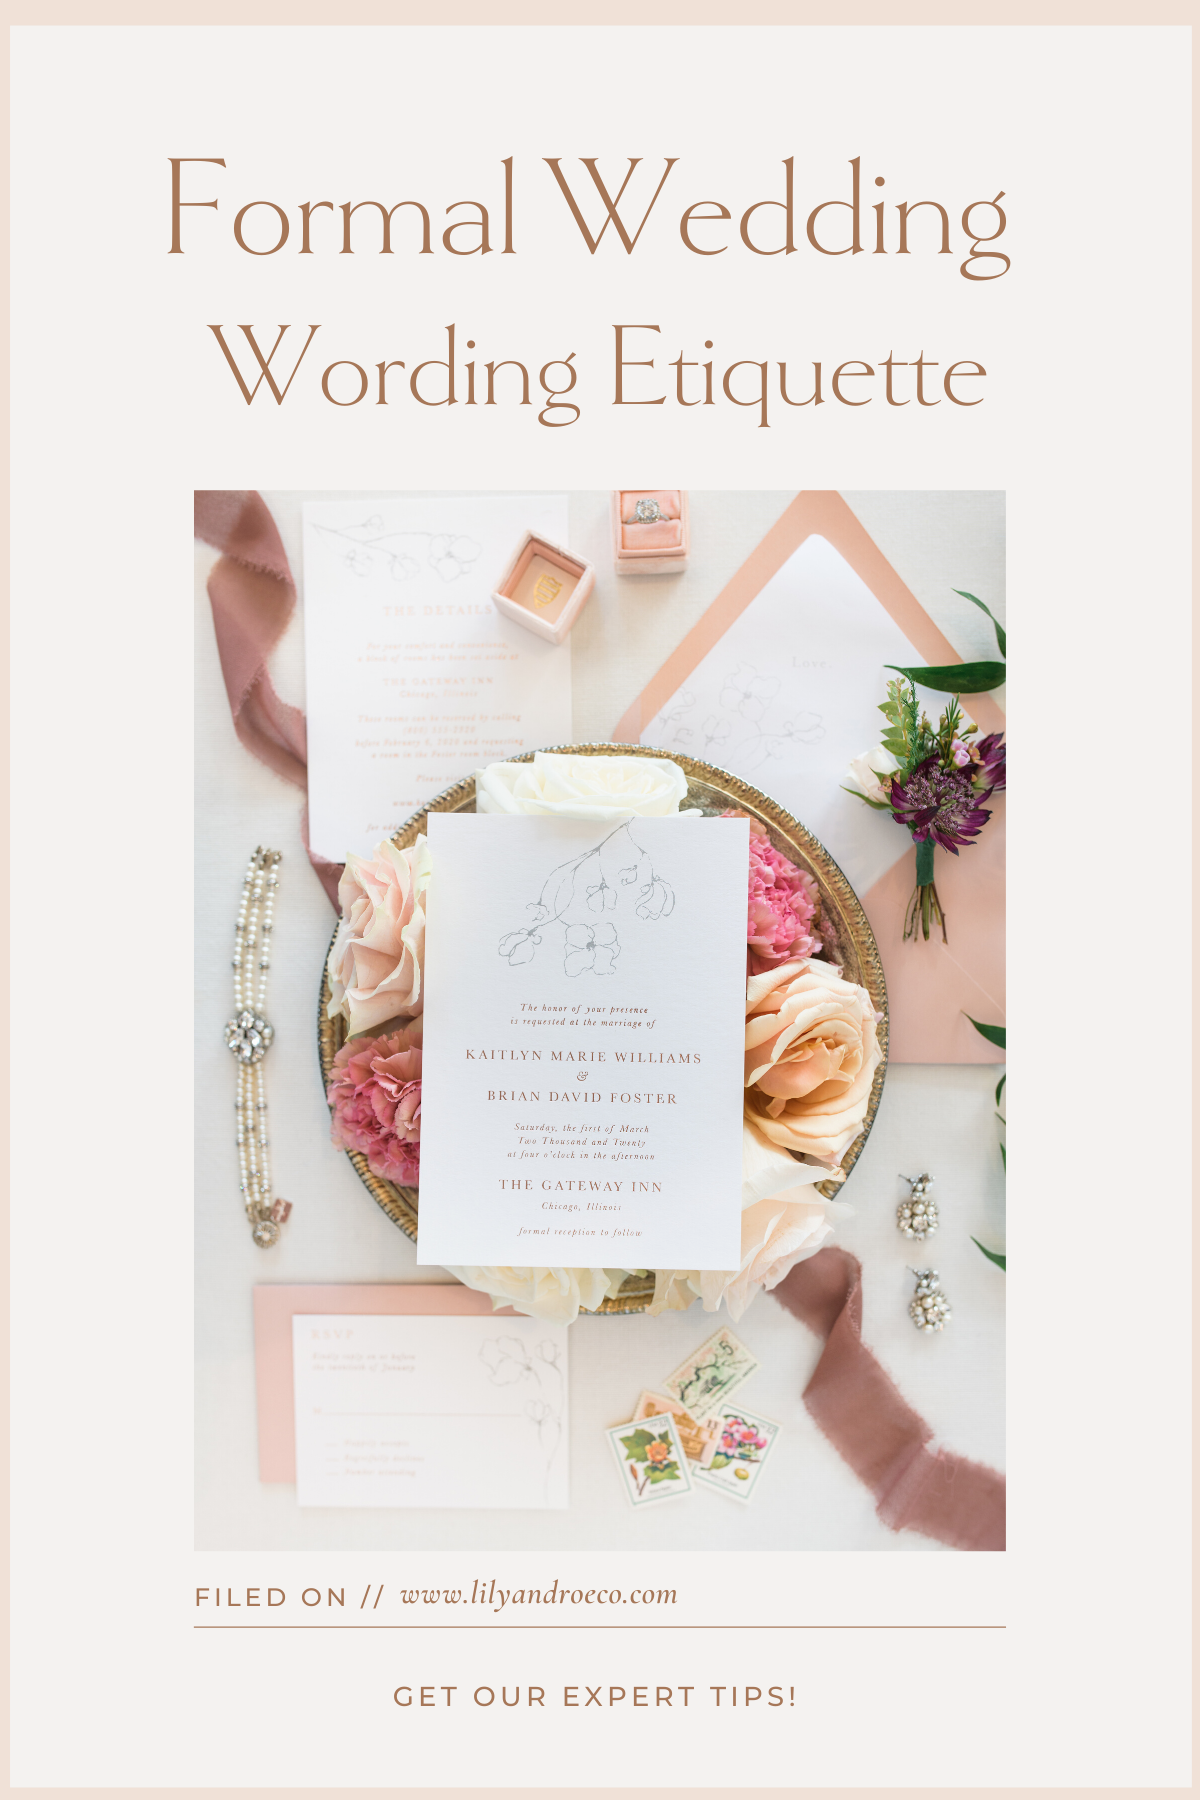 Formal Wedding Invitation Wording Examples & Pro Tips